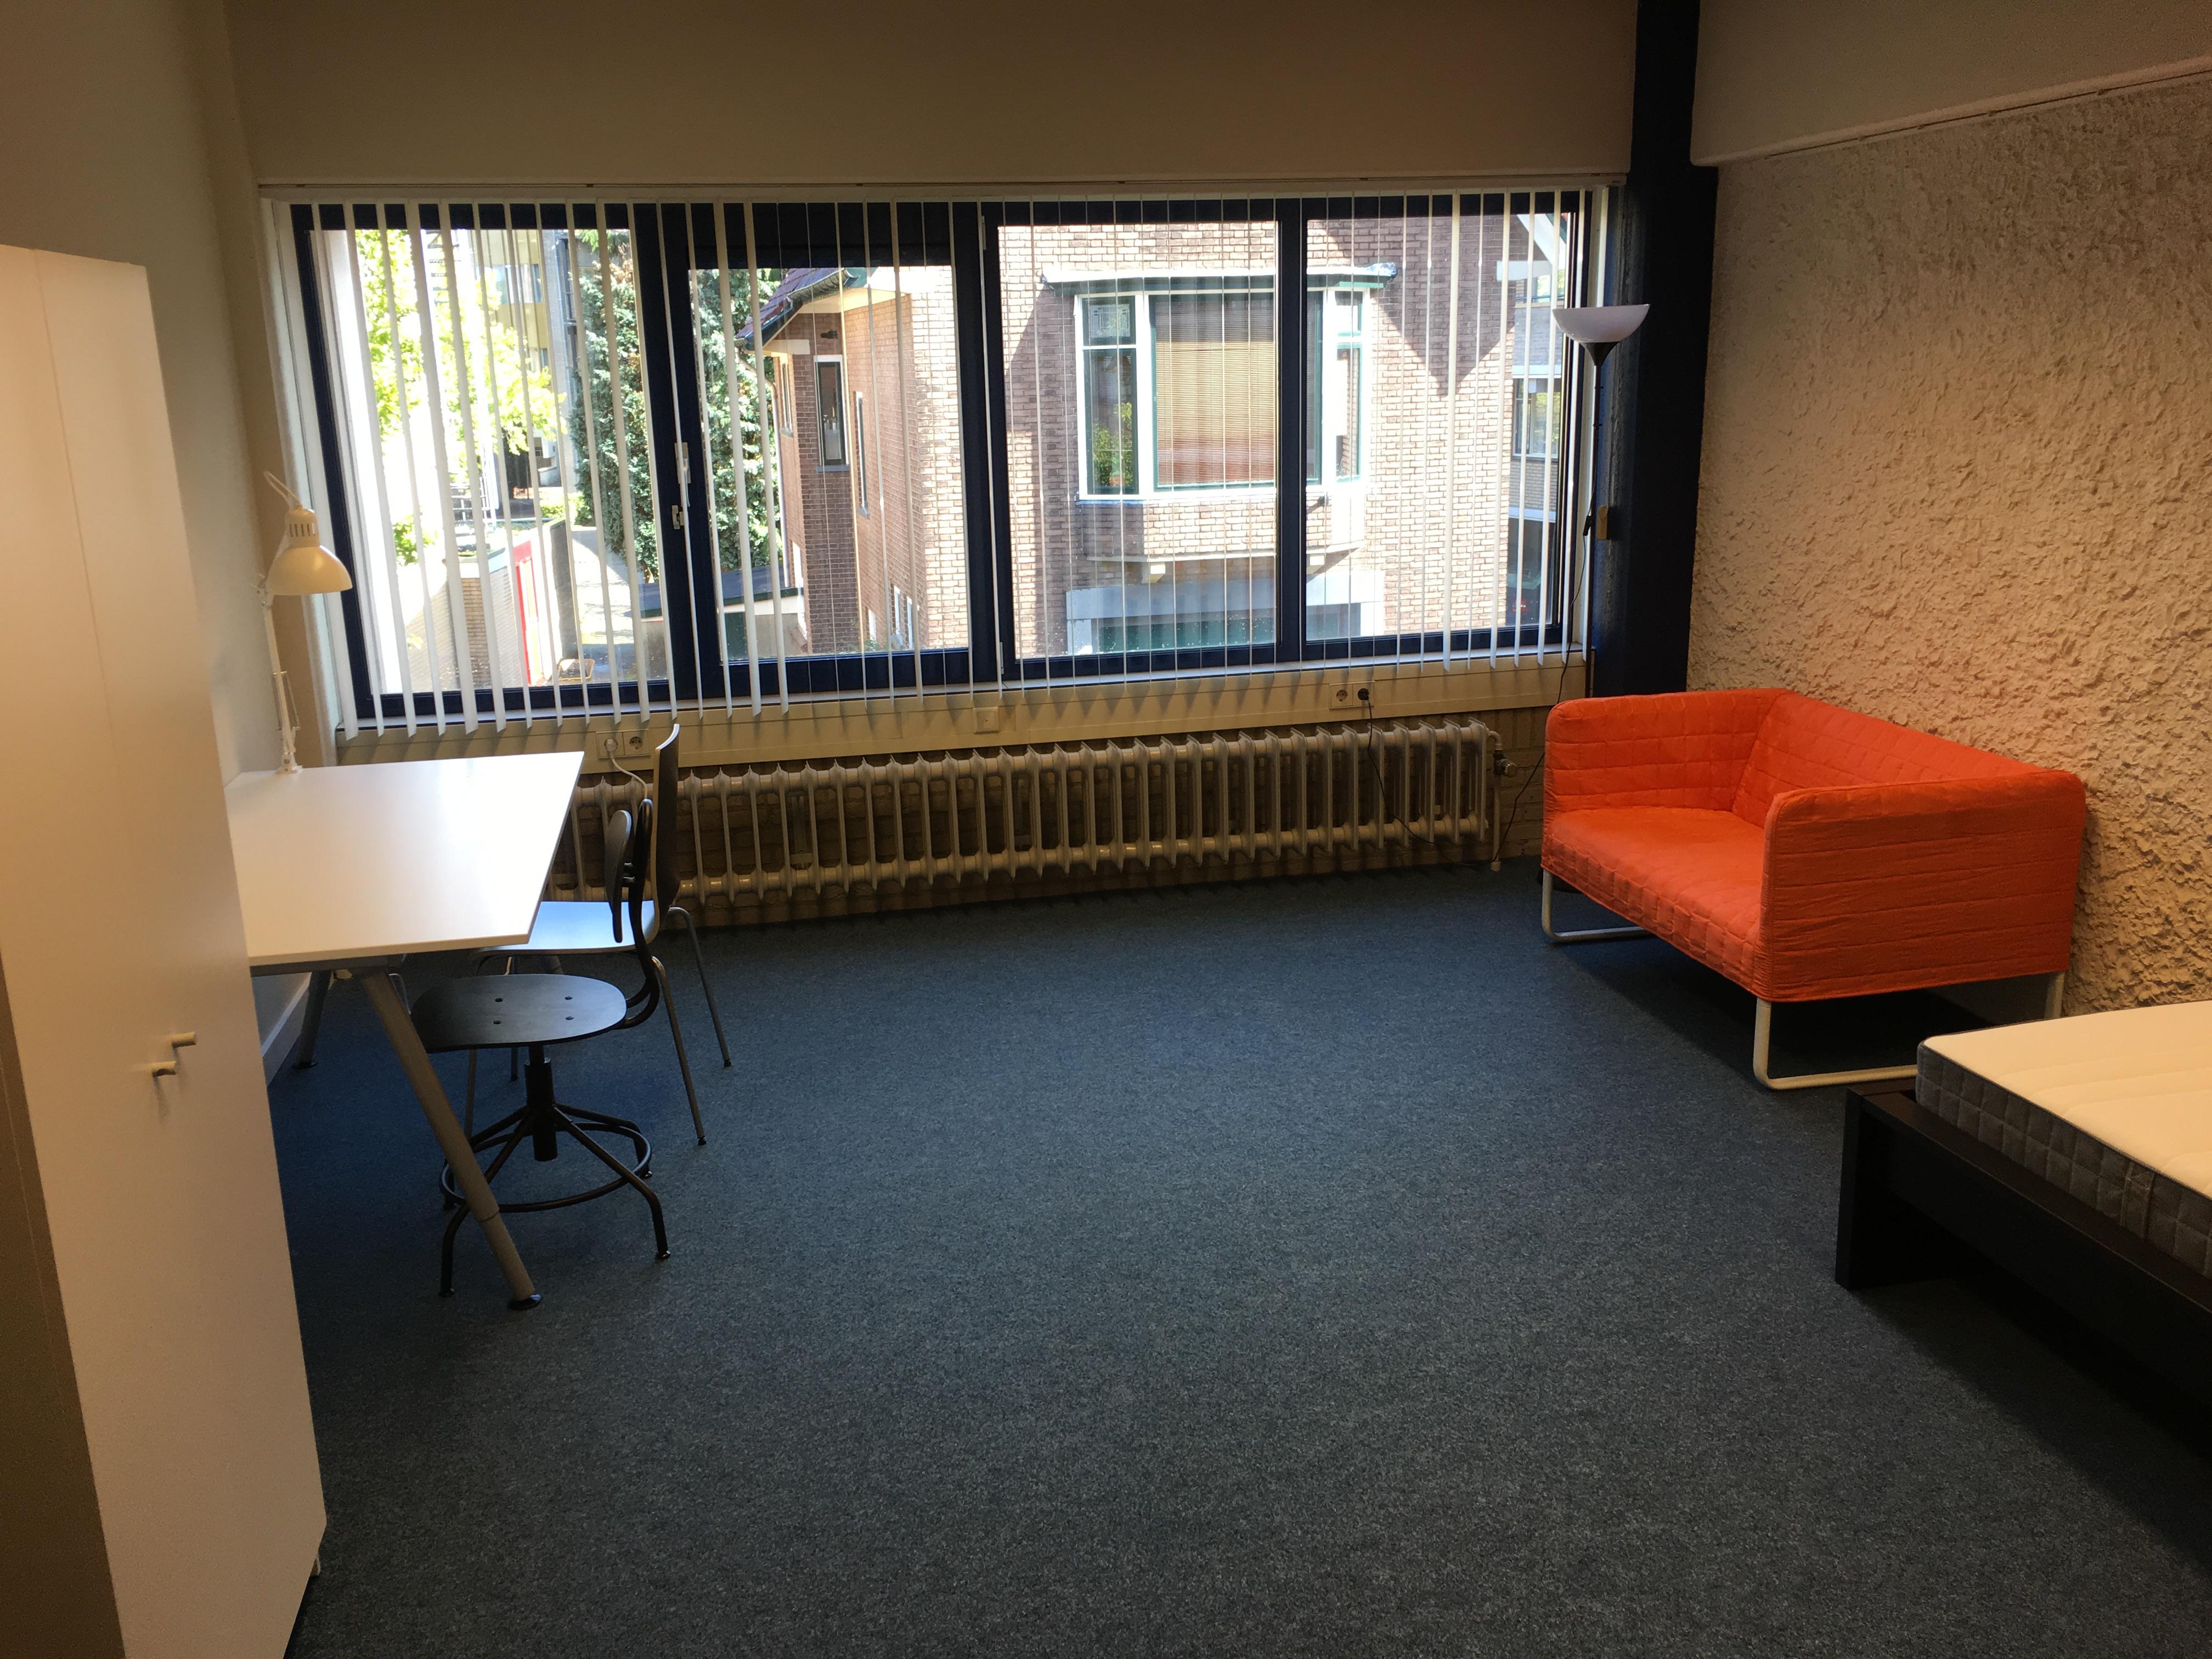 University Of Amsterdam Student Room